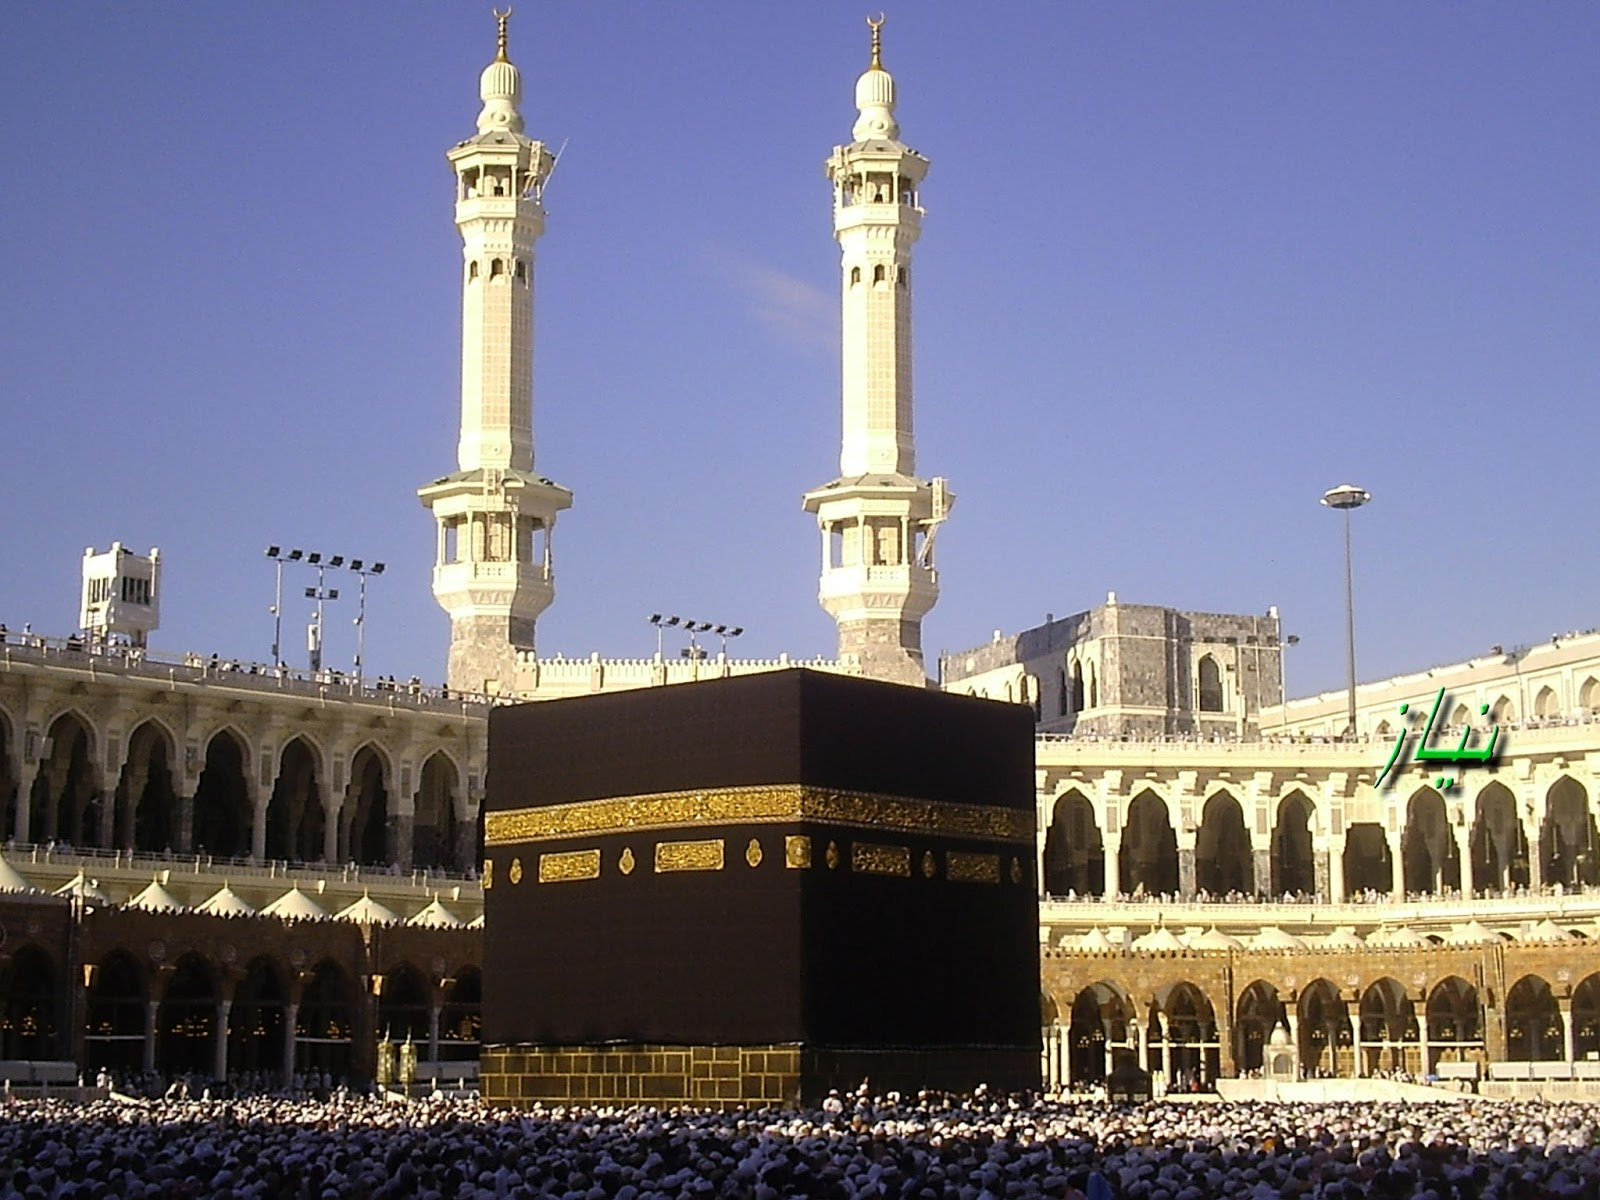 Wallpaper iphone kabah - Islamic Wallpapers